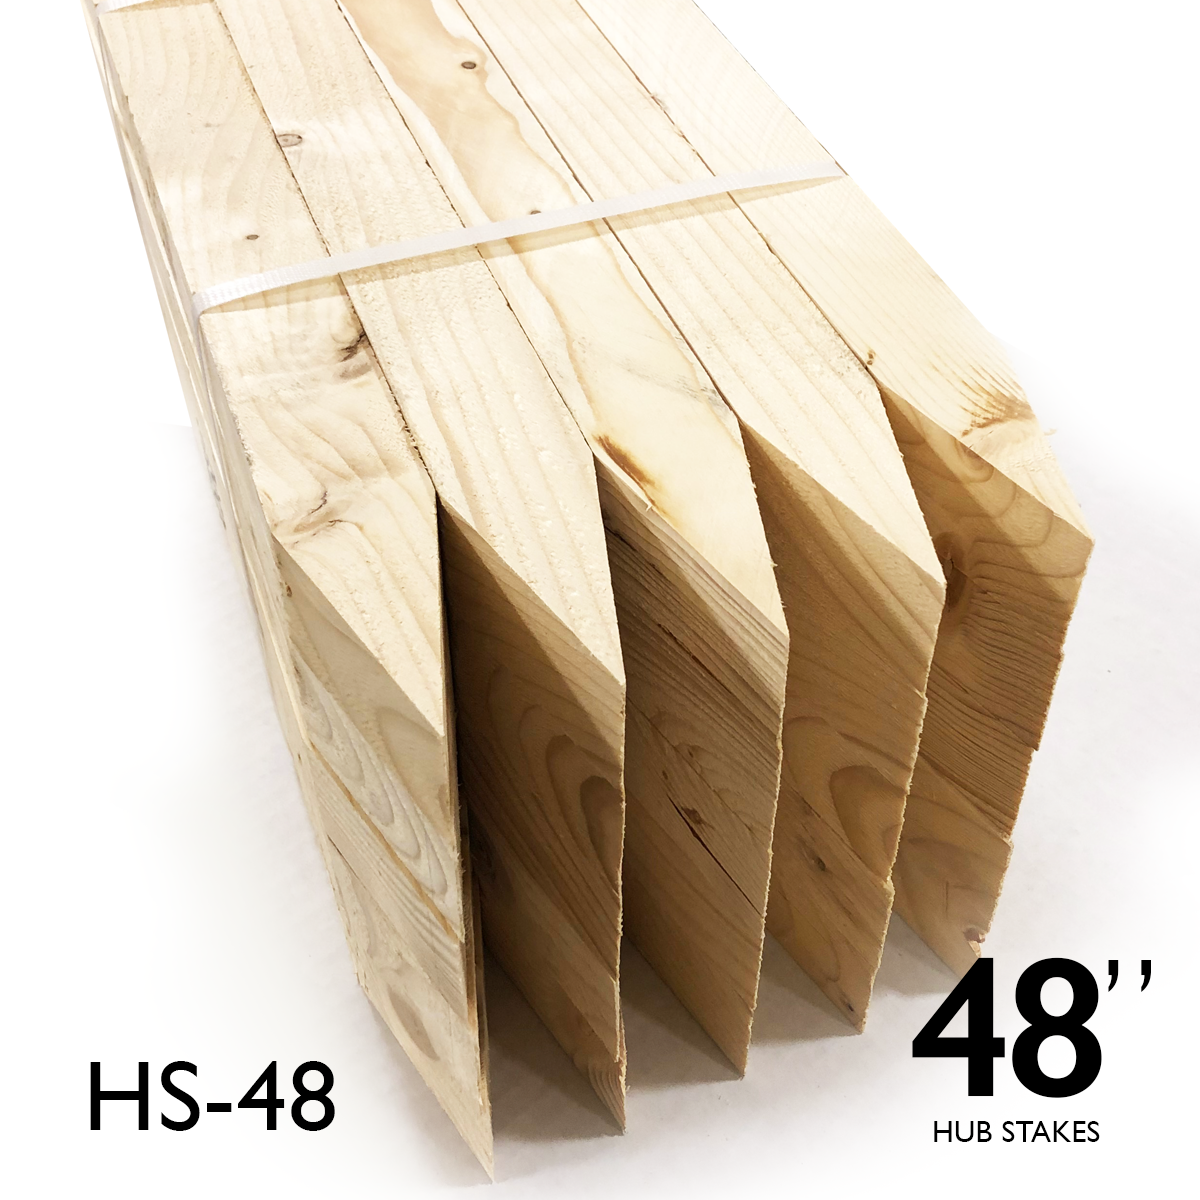 "Hub Stakes 2 X 2 X 48"" FULL Pallet"